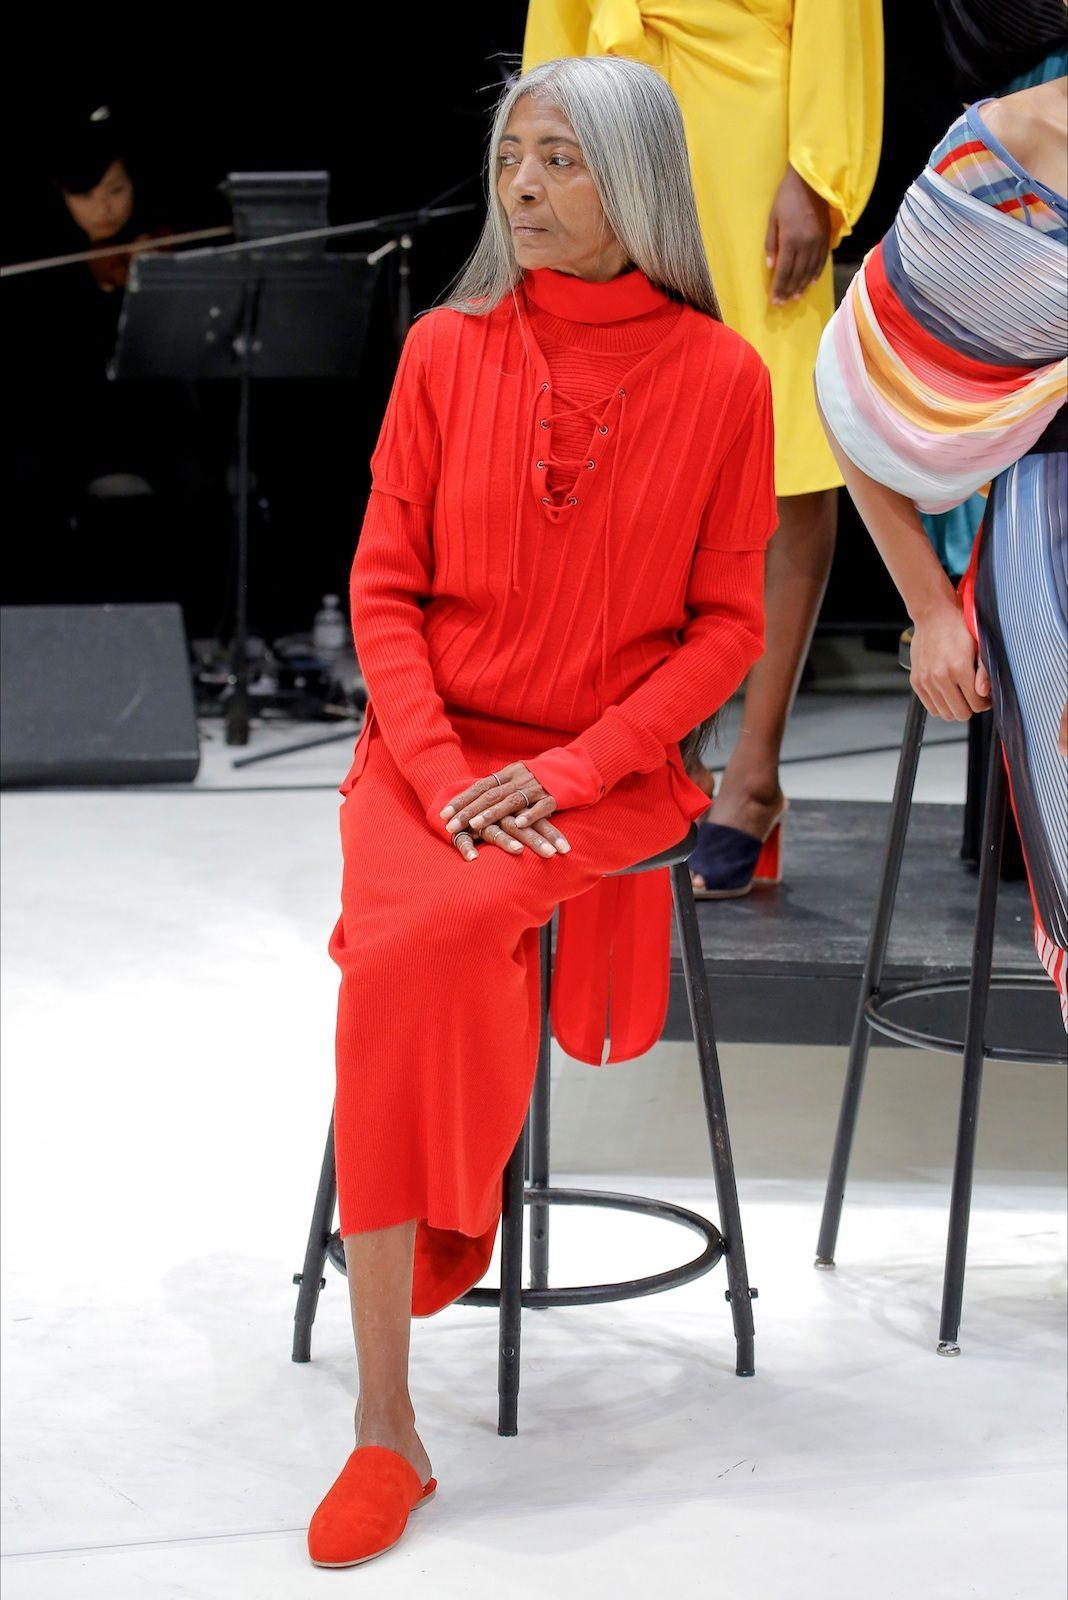 New York Fashion Week Not Only Twenty